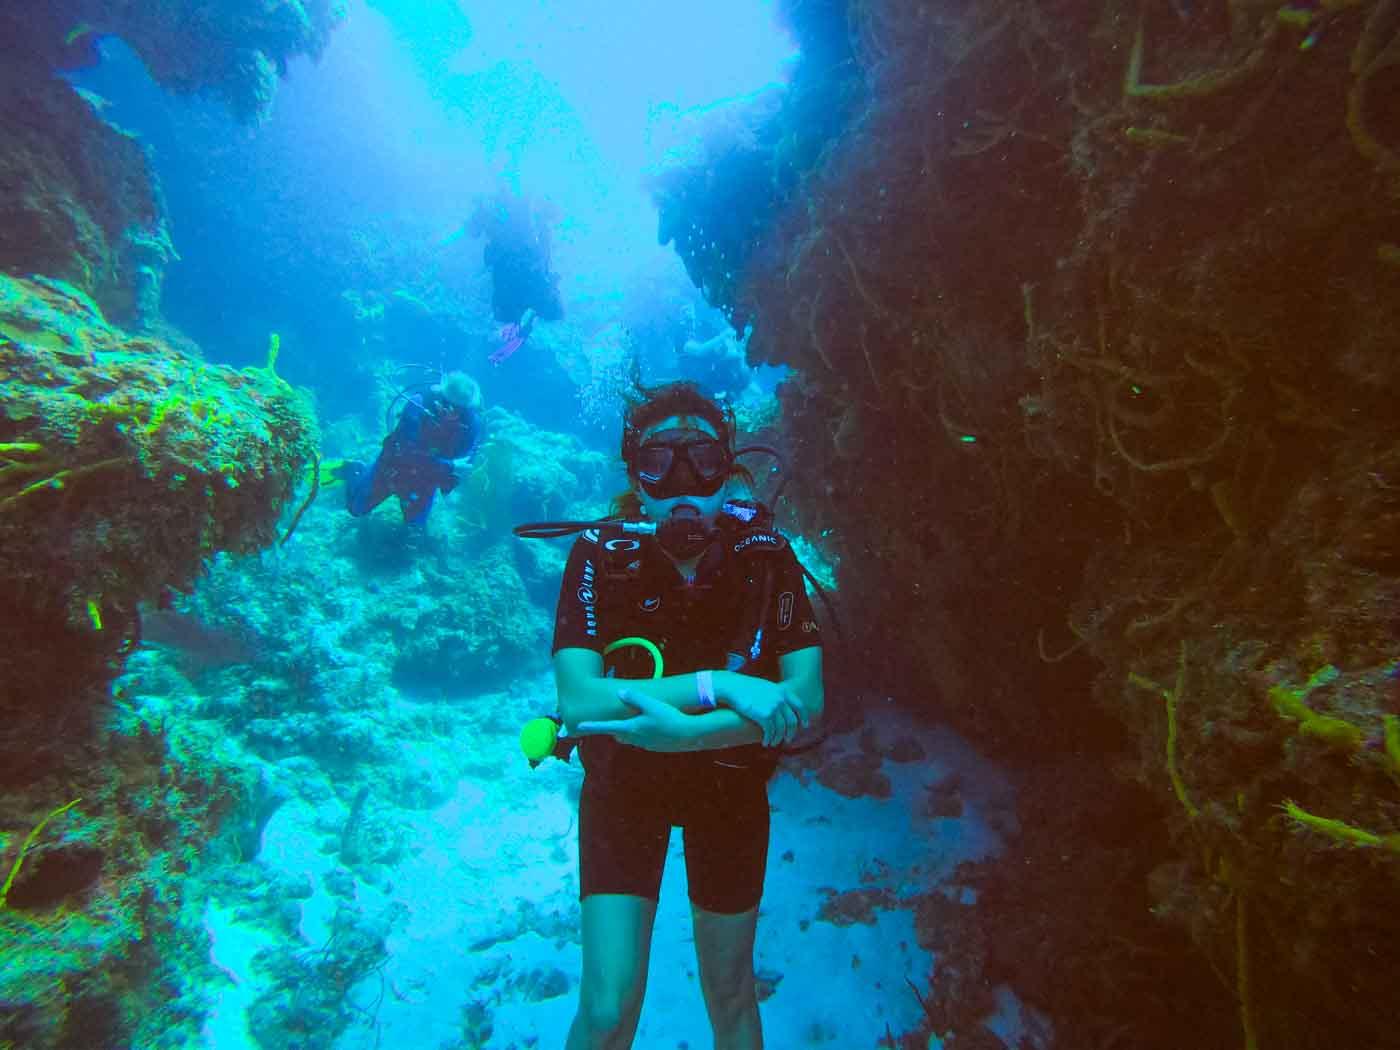 Scuba_Diving_Cozumel_Scuba_Tony_Mexico_Travel_Blogger_Indian_The_Sassy_Pilgrim_America_Quintana_Roo_Yucatan_Riviera_Maya_Adventure_